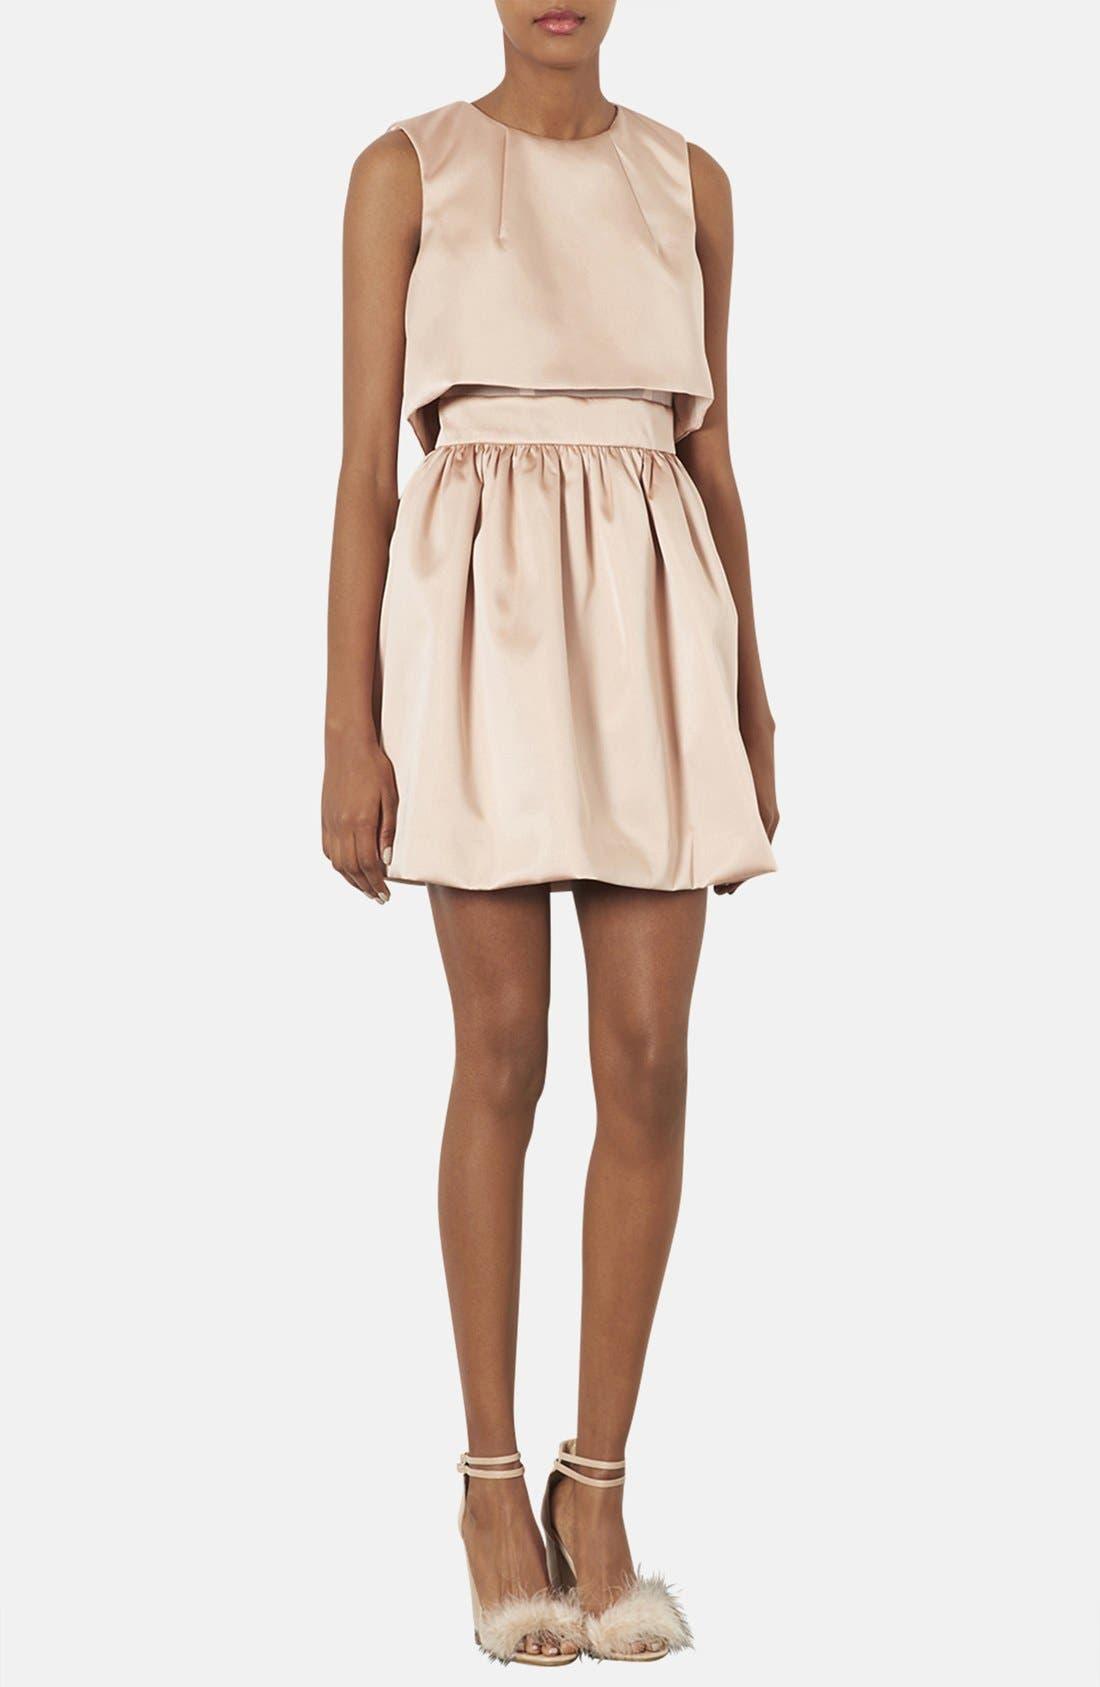 TOPSHOP, 'Duchess' Crop Overlay Satin Skater Dress, Main thumbnail 1, color, 250